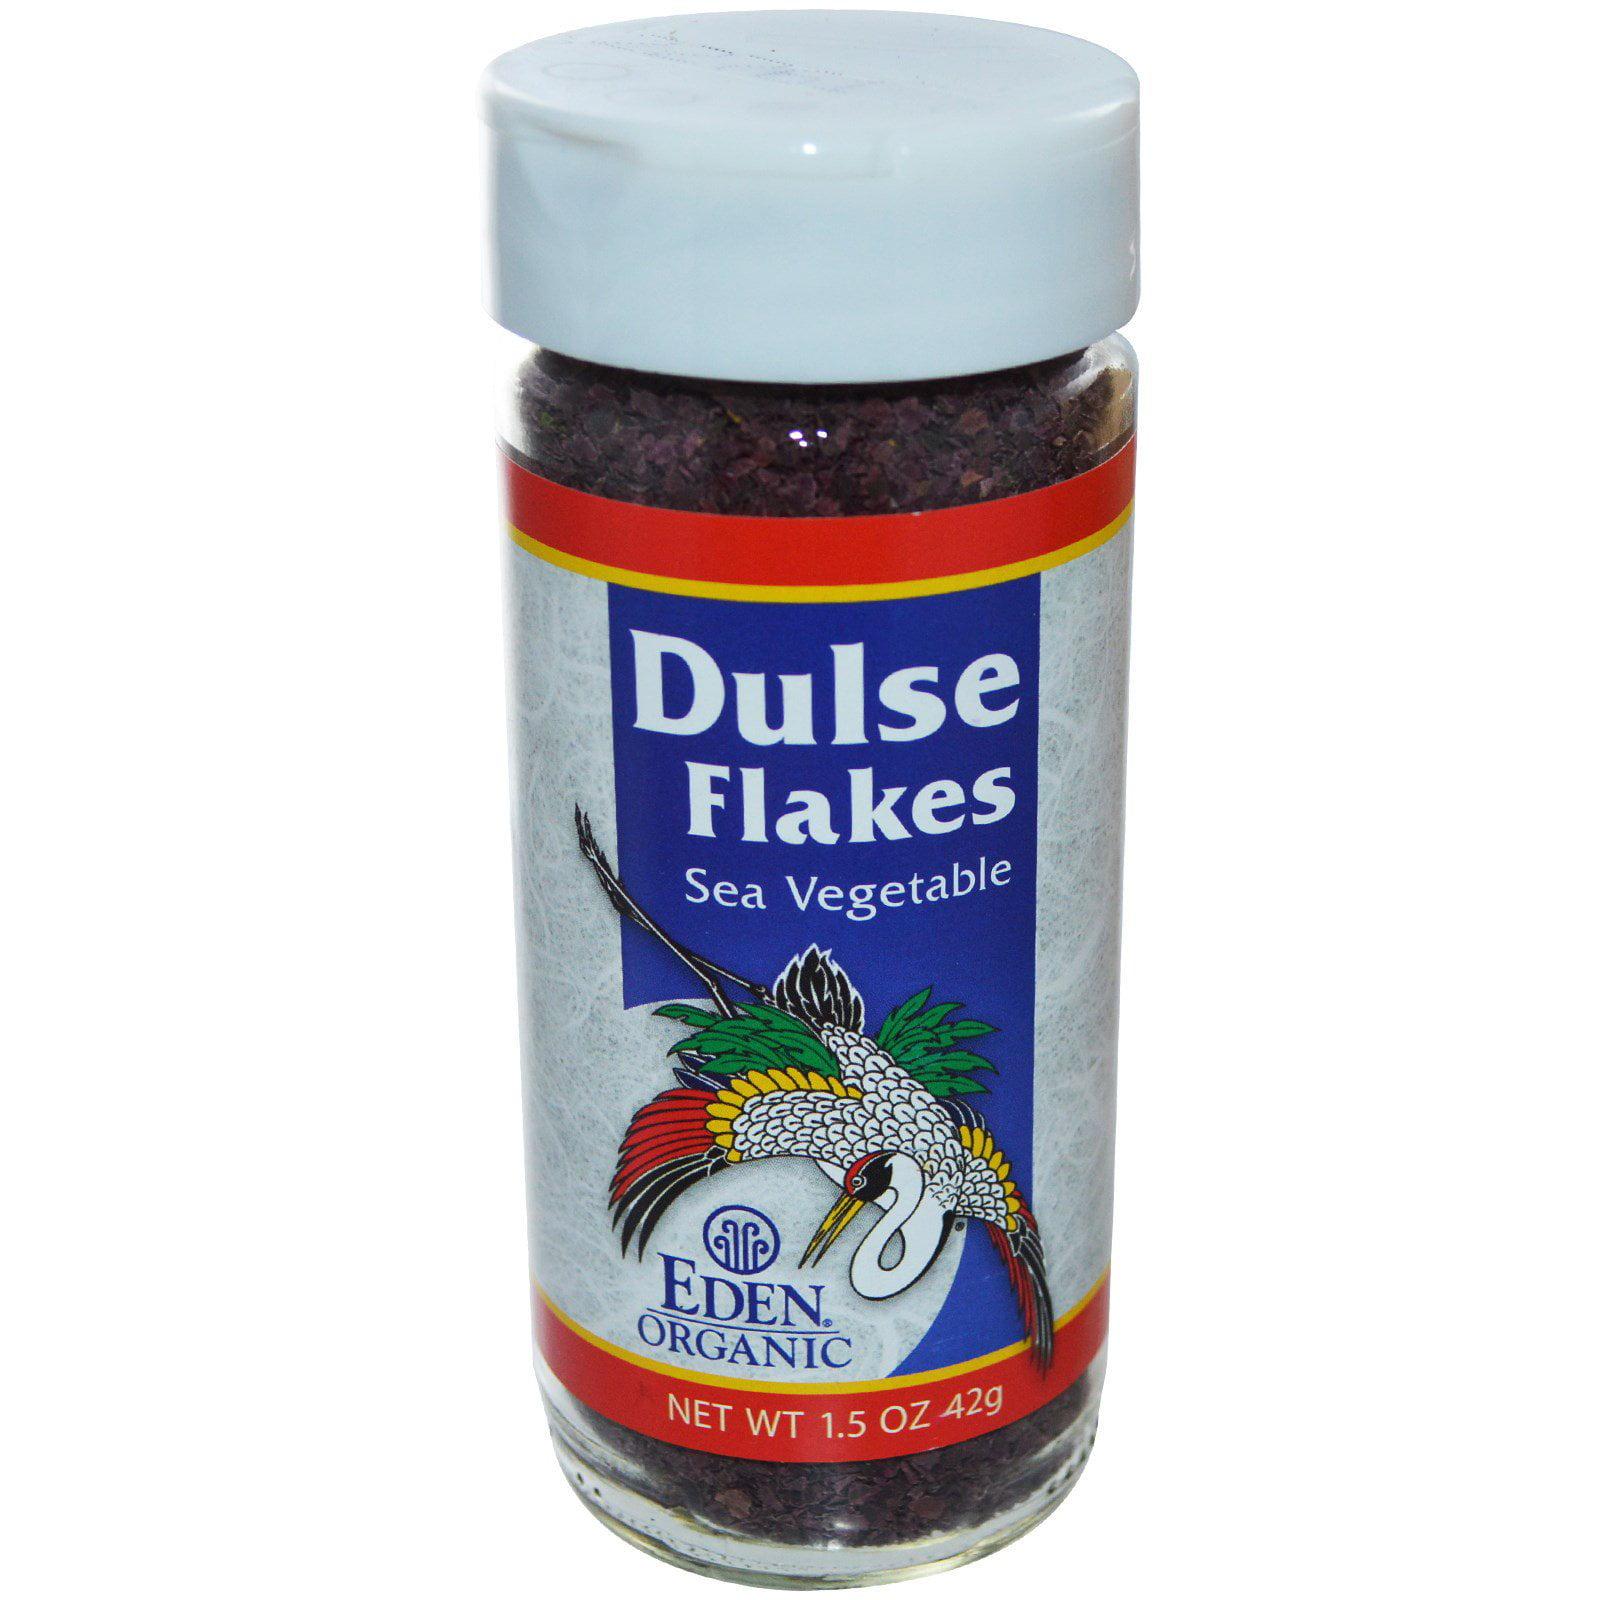 Eden Foods, Organic, Dulse Flakes, Sea Vegetable, 1.5 oz ...